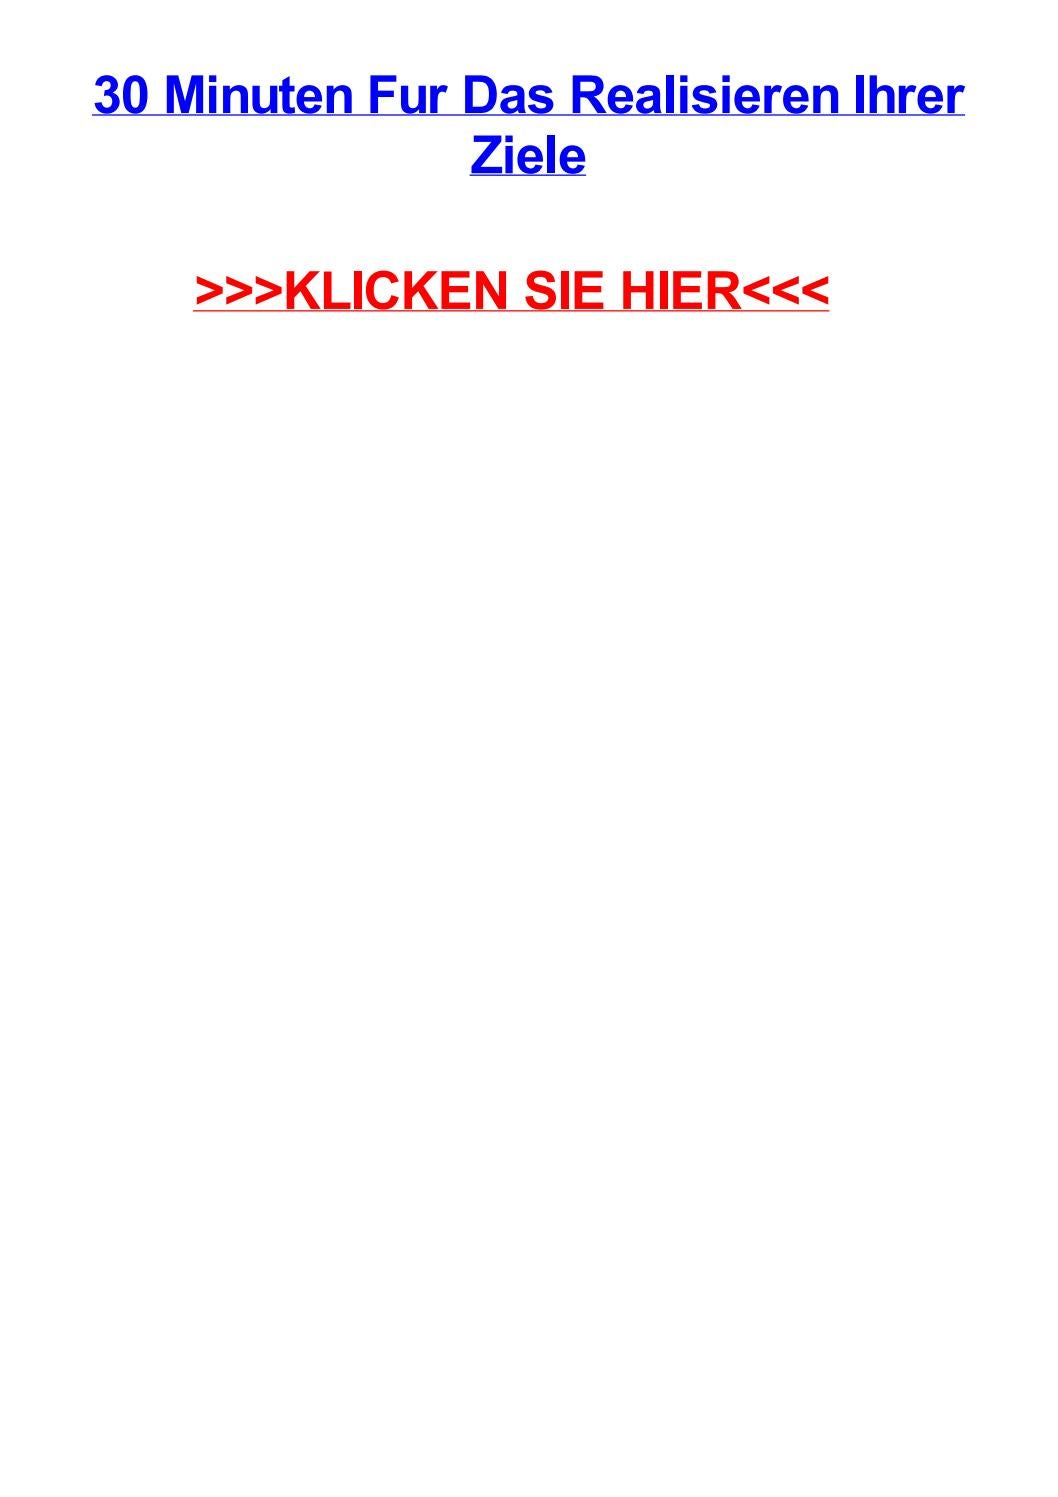 Strichmädchen Lauter-Bernsbach